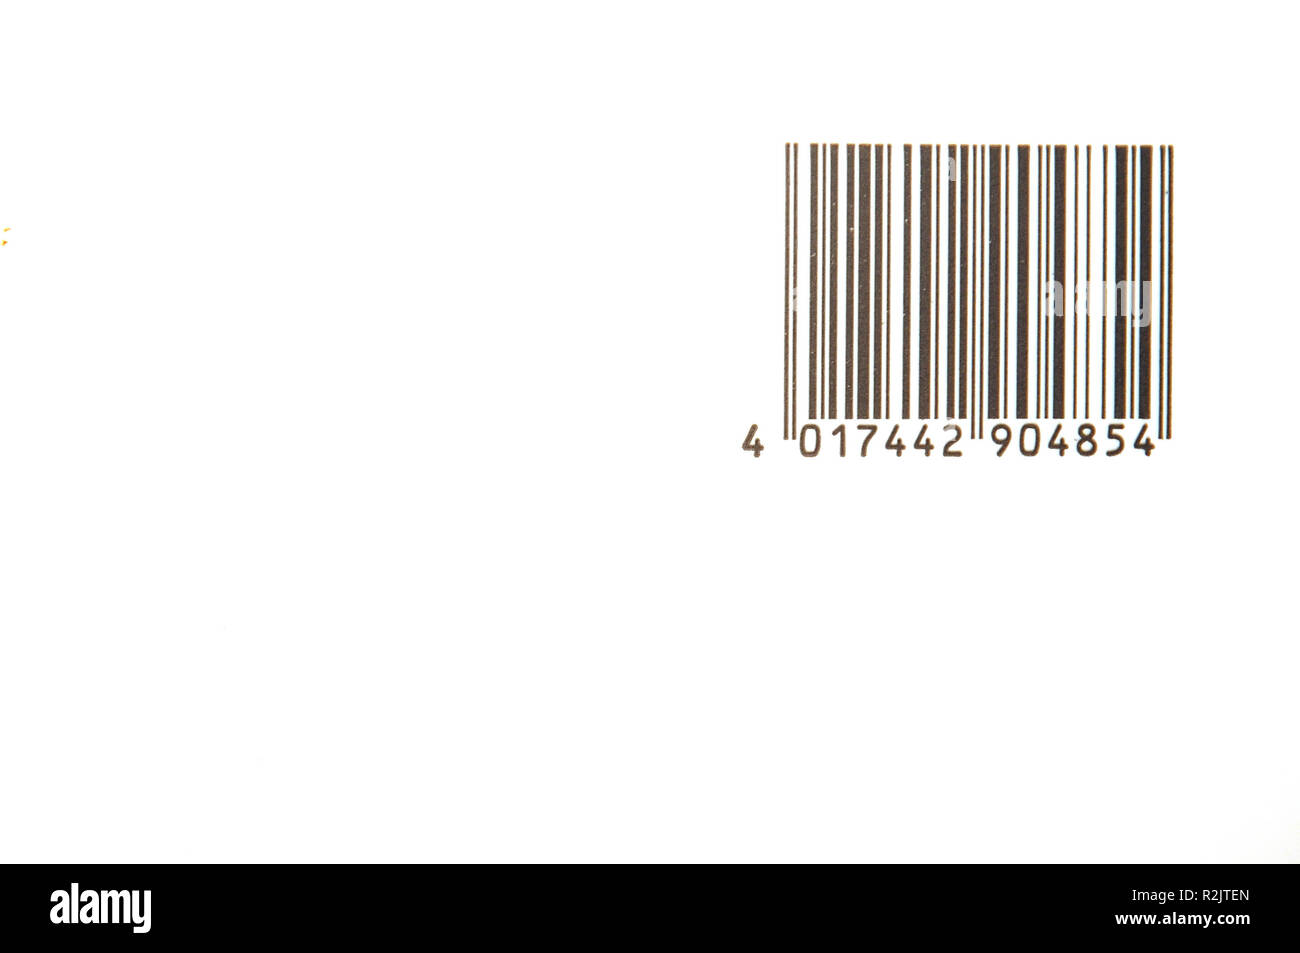 barcode on white background - Stock Image